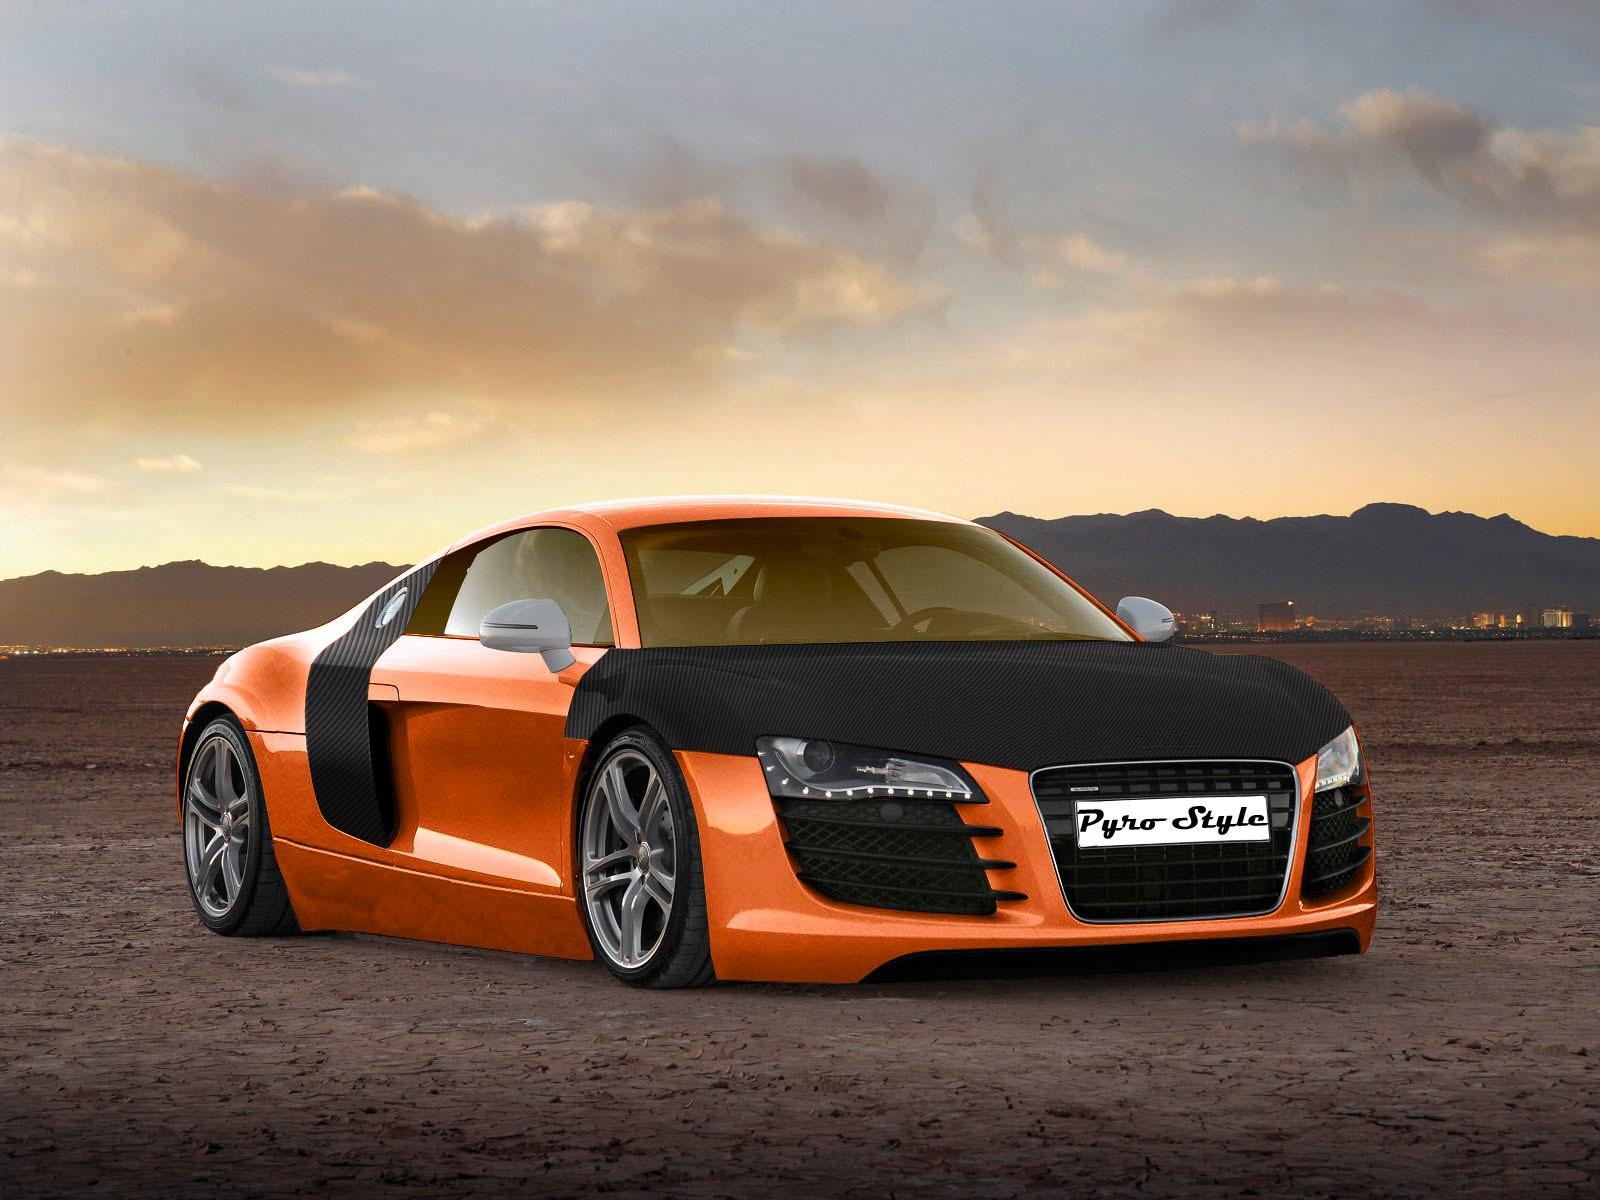 Top speedy Autos: Audi R8 HD Wallpapers